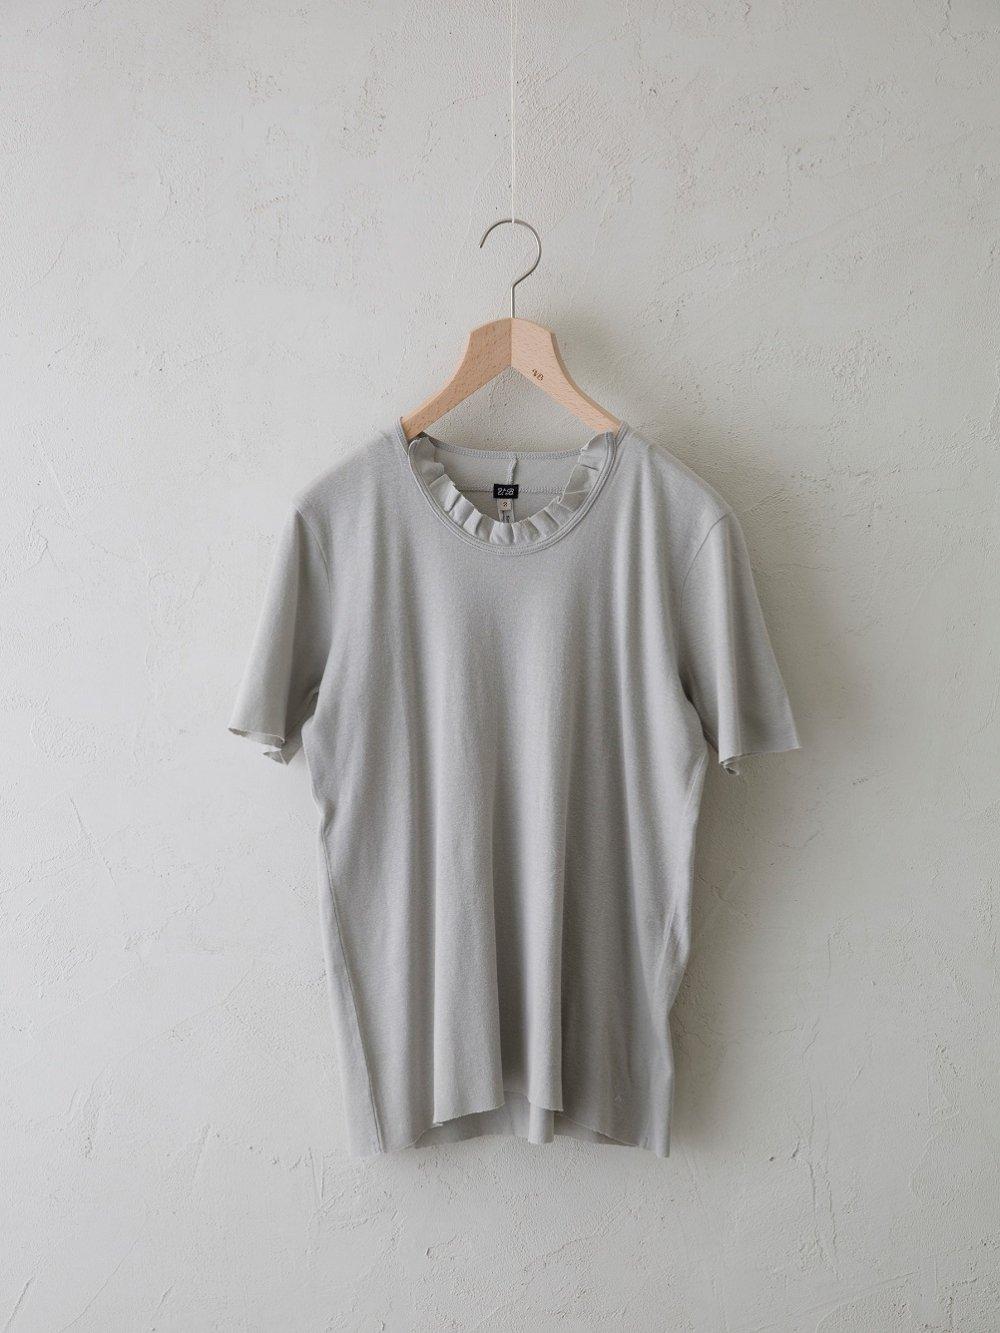 & 12 Linen(フライス) 半袖フリルプルオーバー -standard-